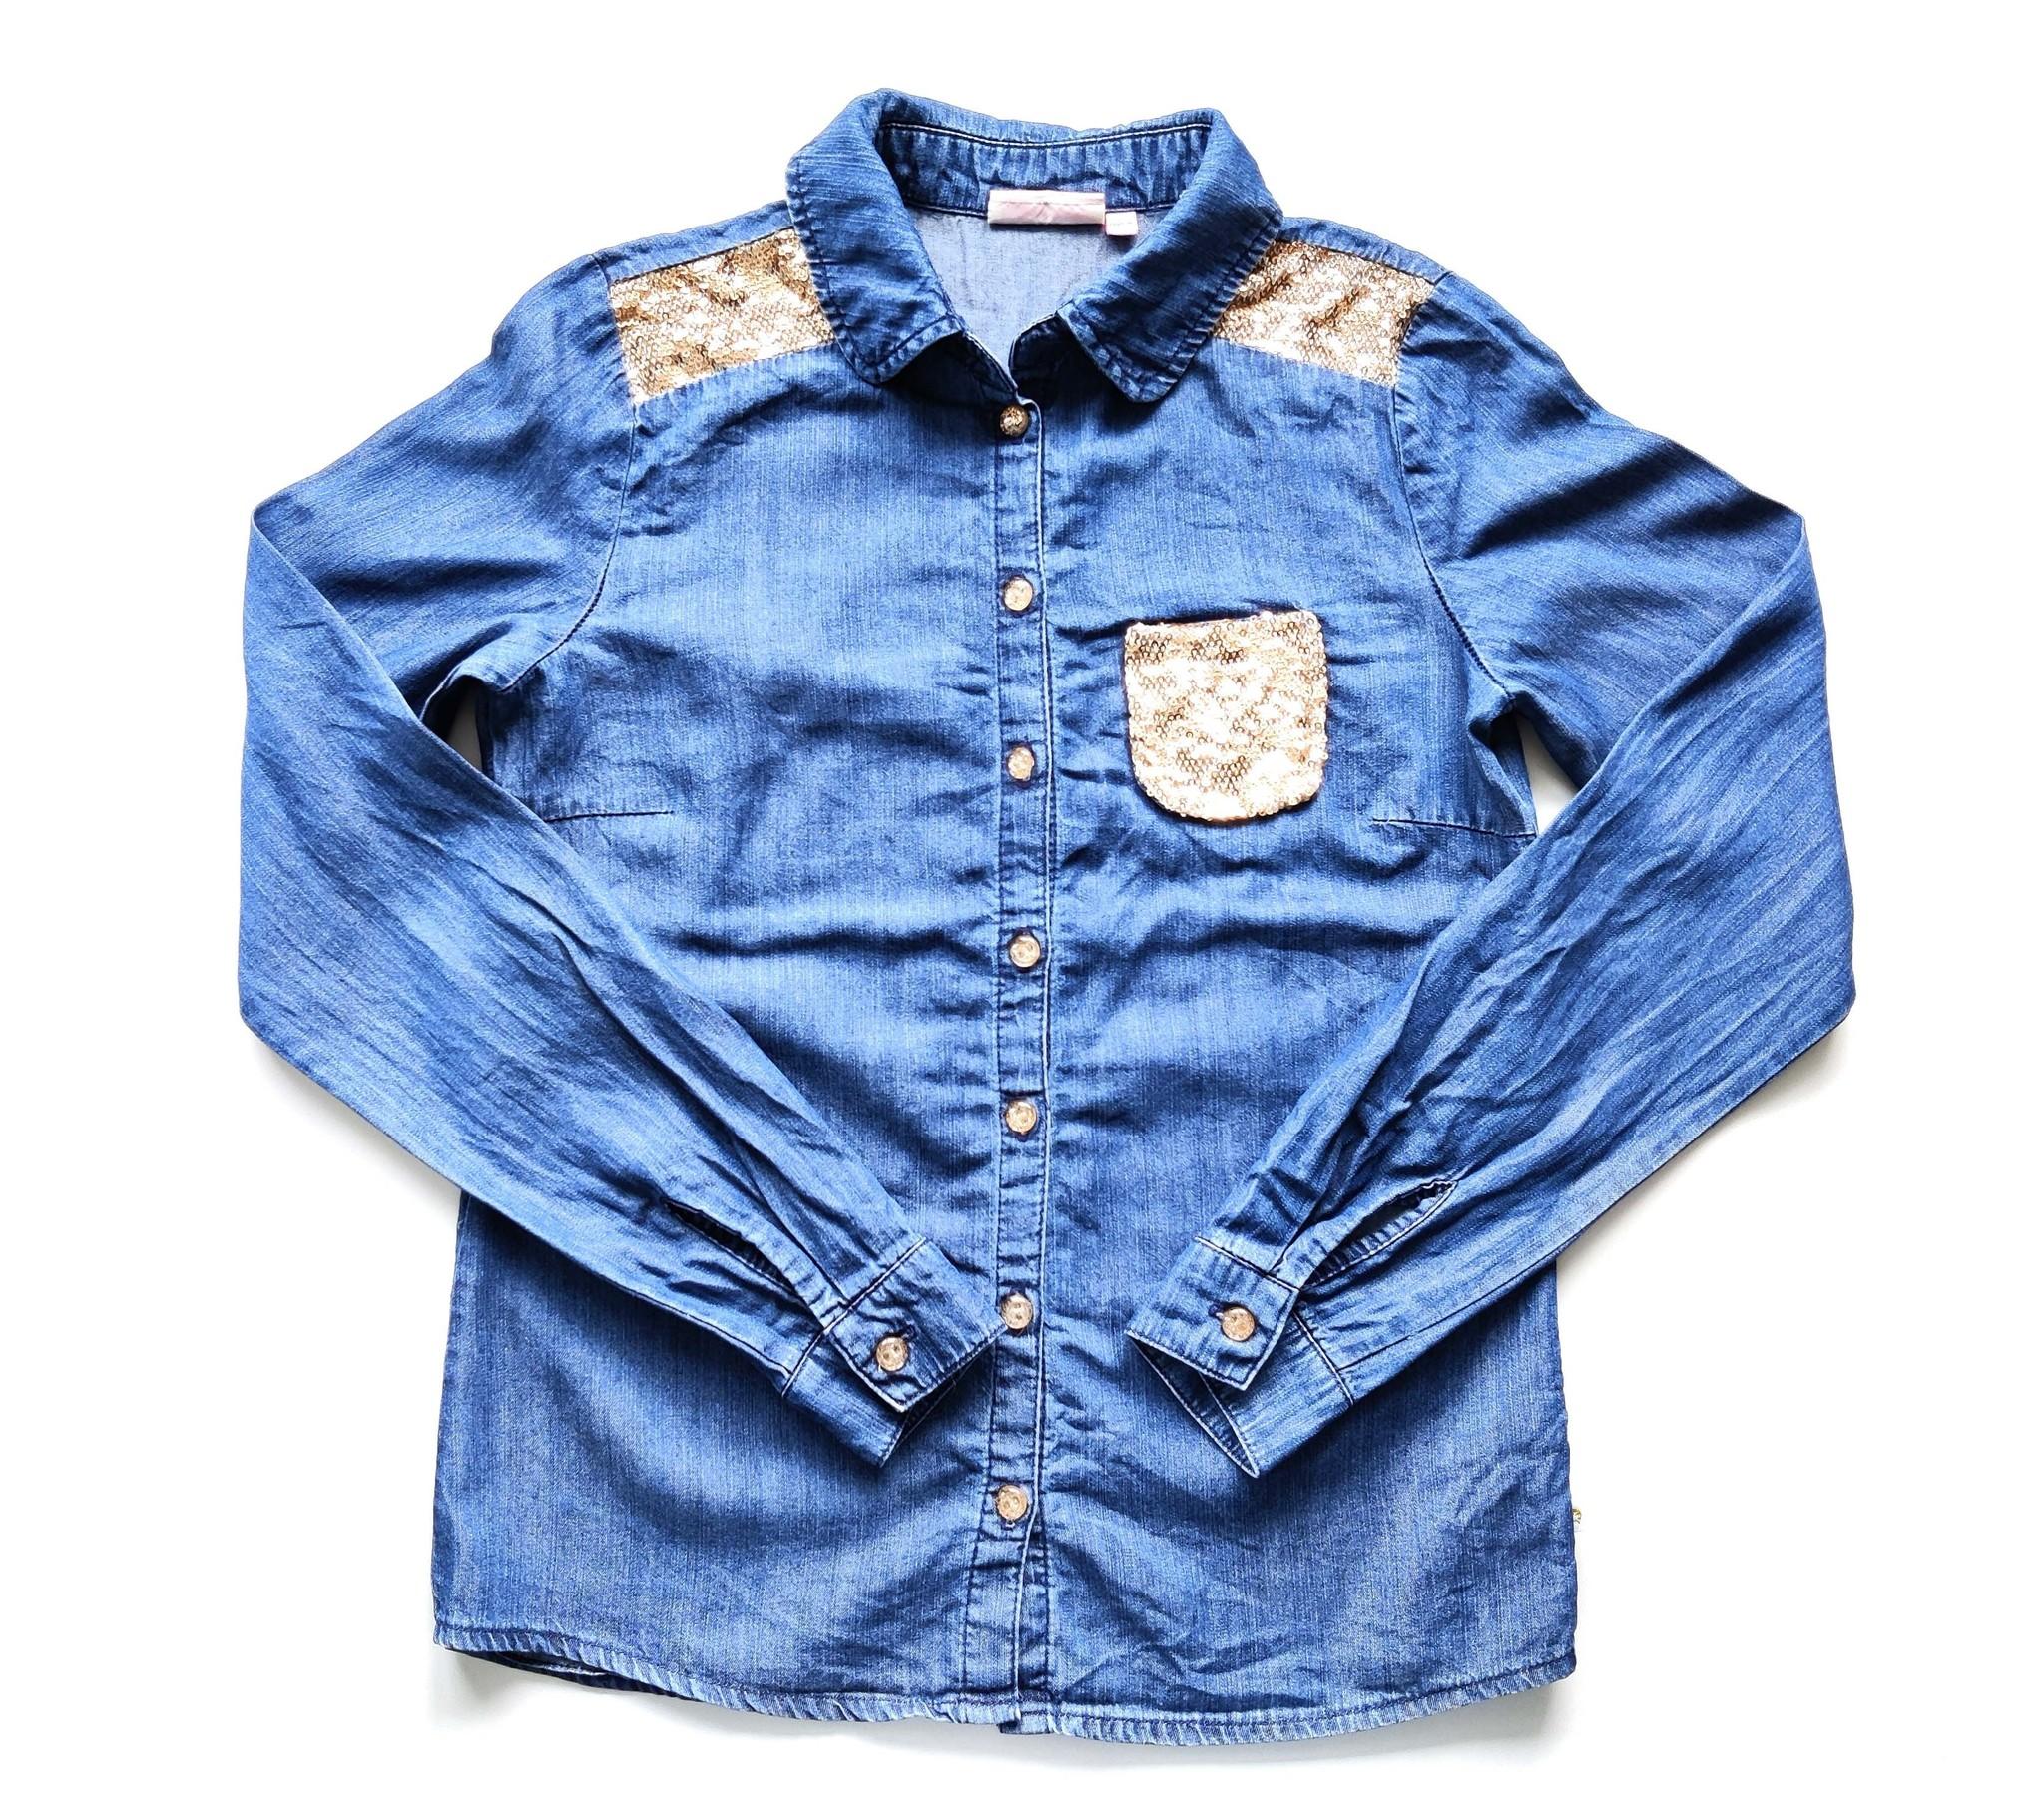 Jeans hemd Someone-1